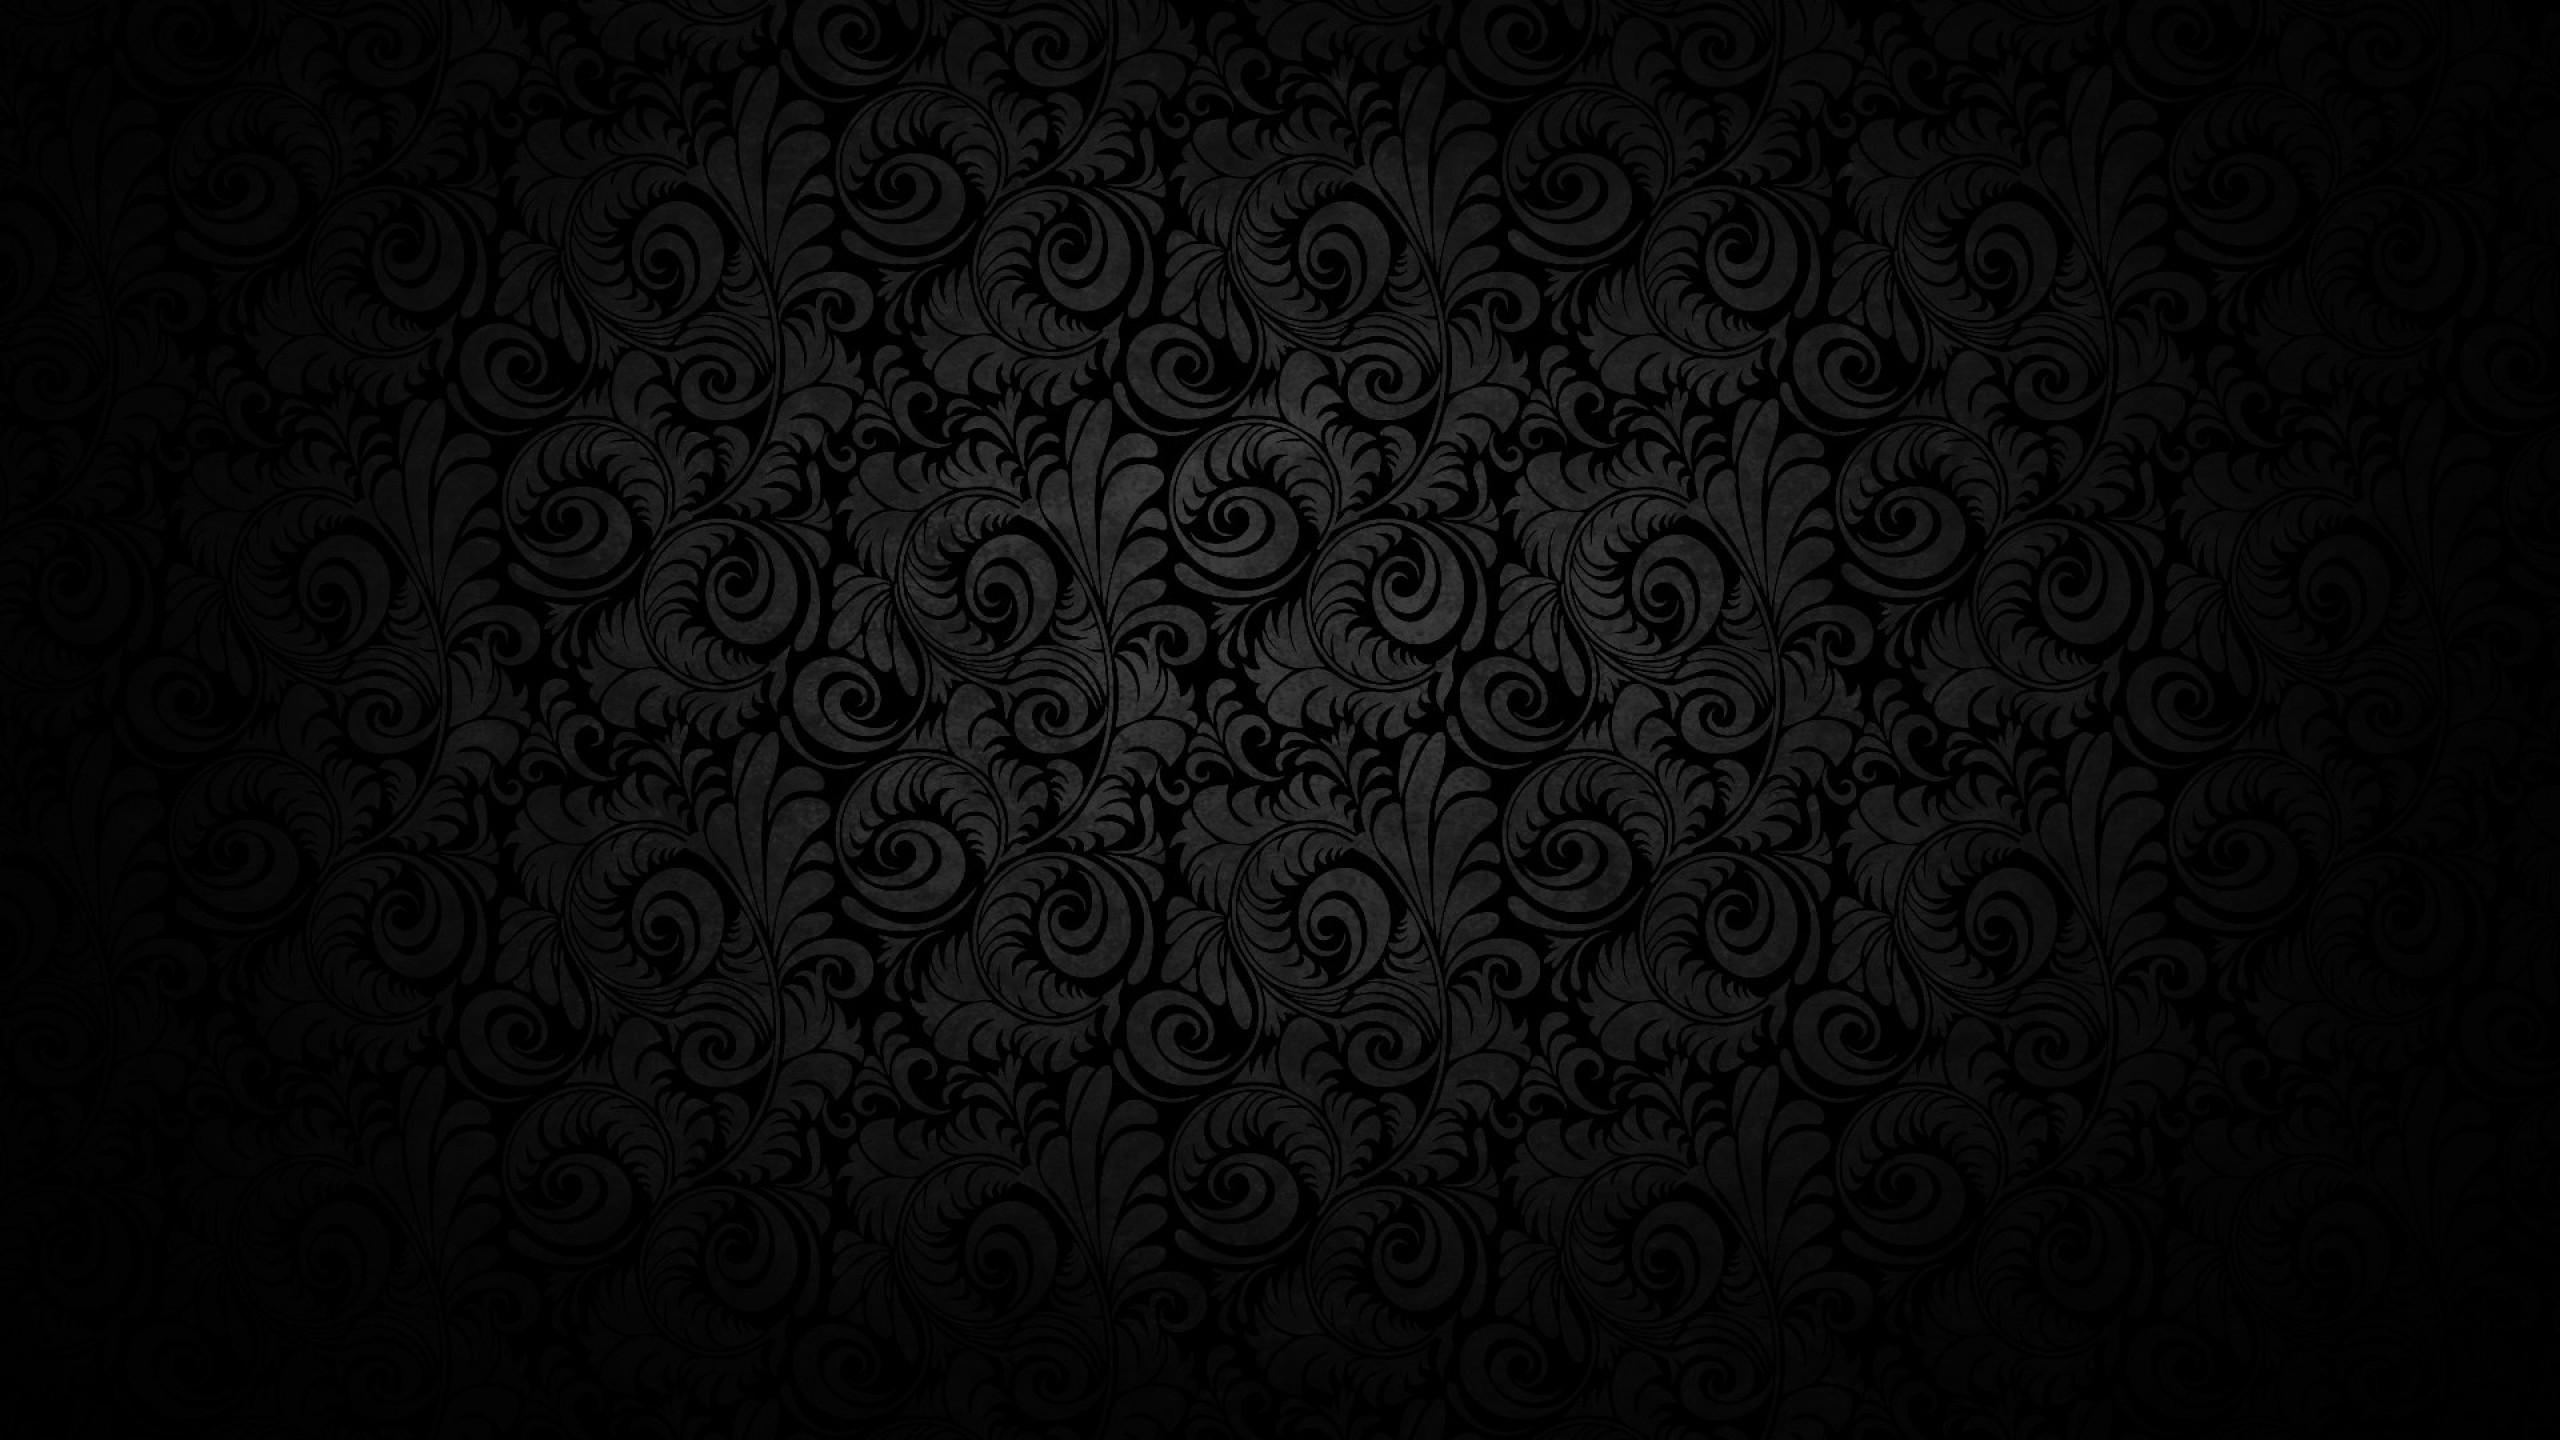 2560x1440 Hd Black Phone Wallpaper